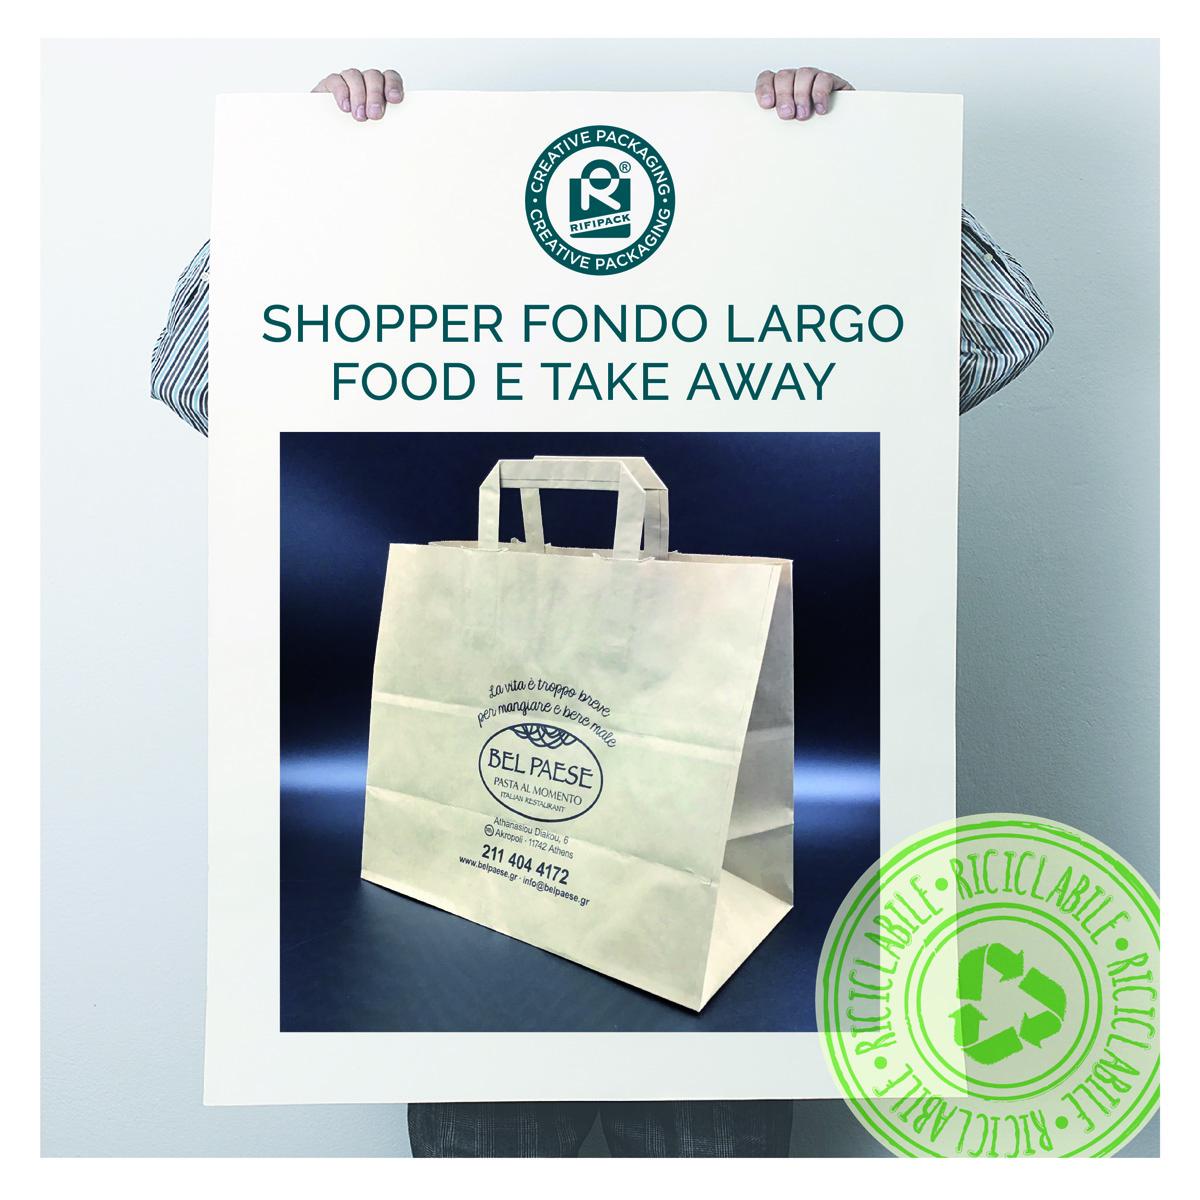 rifipack-shopper-in-carta-riciclata-fondo-largo-food-drink-take-away-1